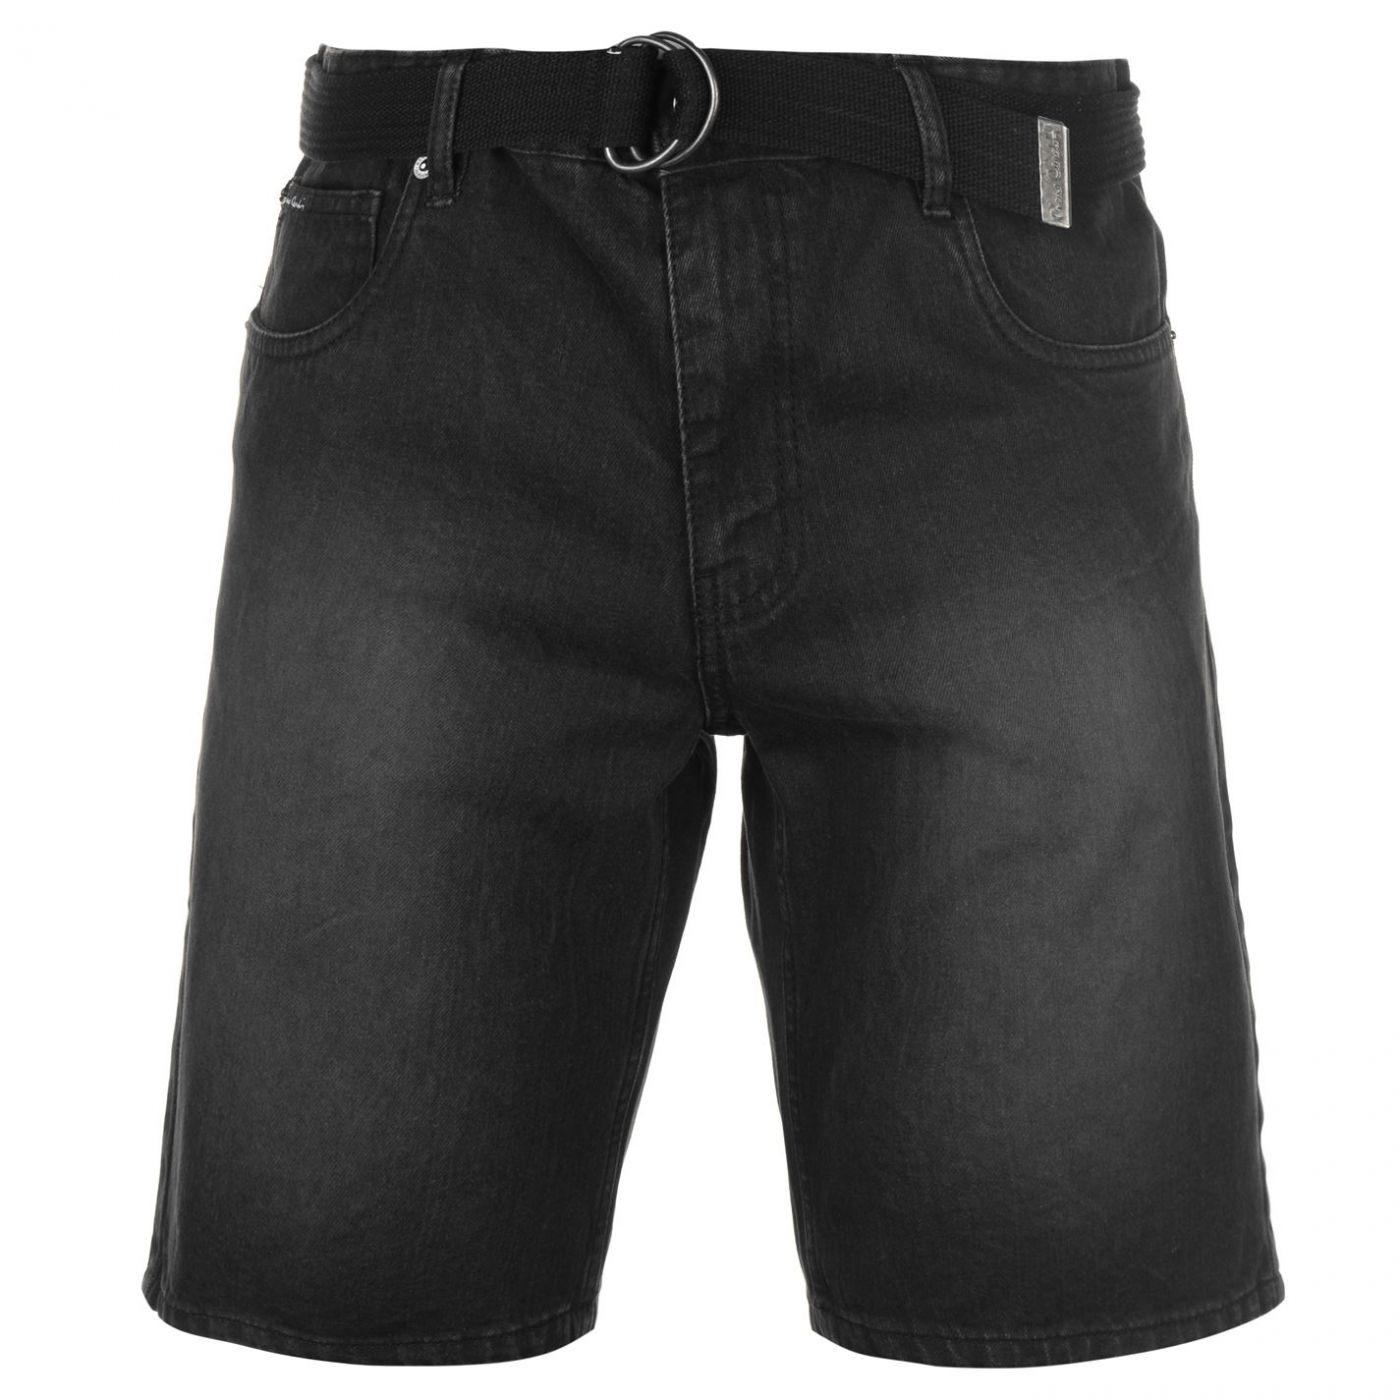 Pierre Cardin Denim Web Belt Shorts Mens